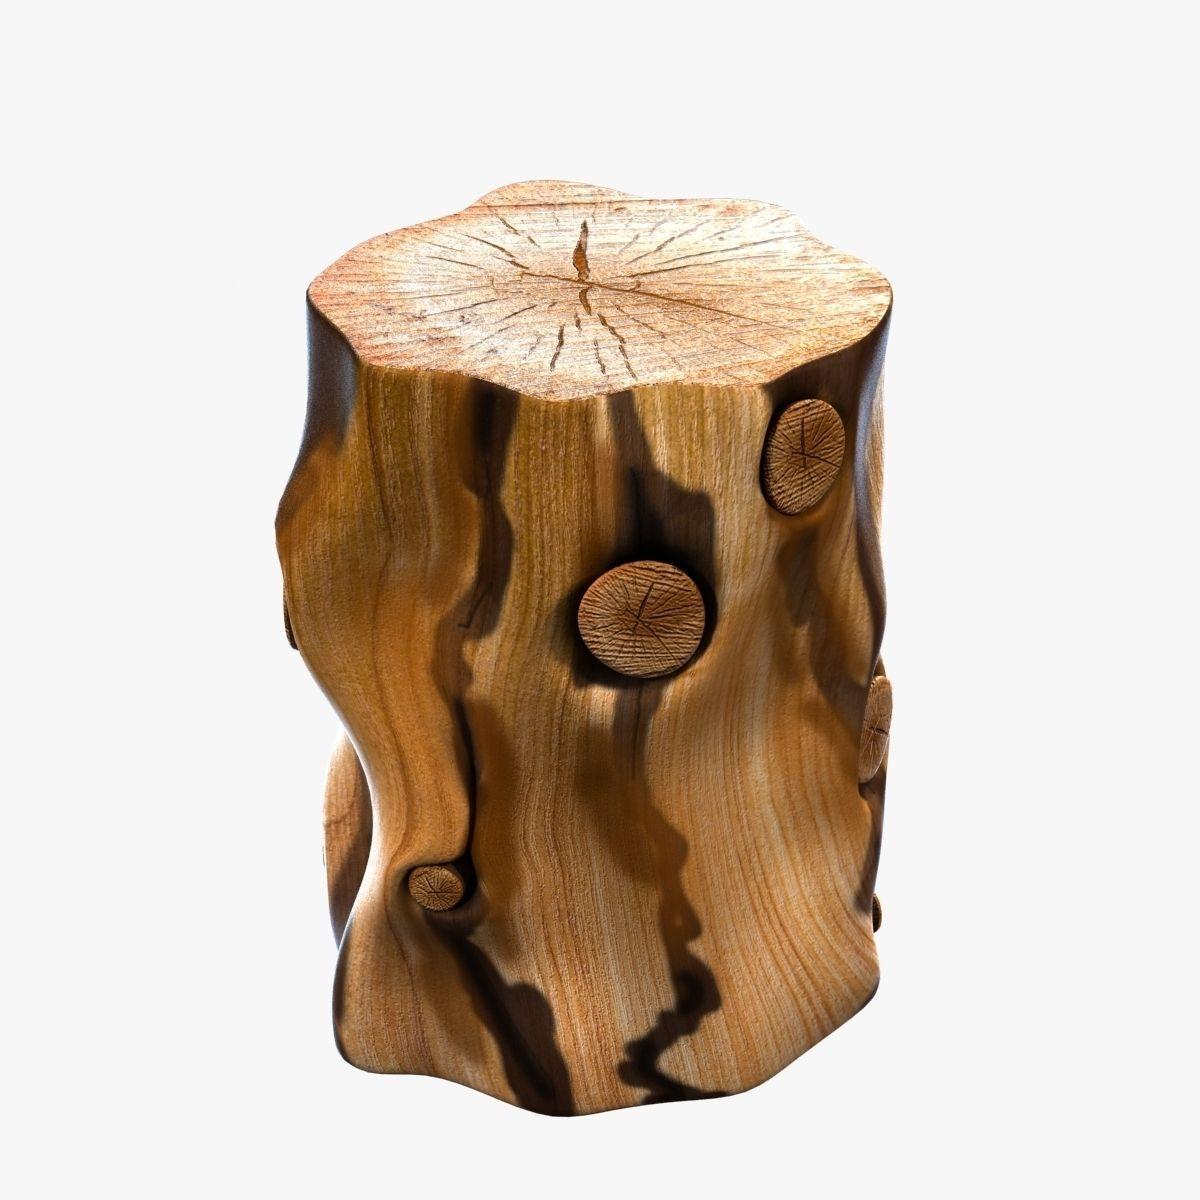 Assorted Glass Tree Stump Table Ireland West Elm Tree Stump Side Table Model Max Obj Fbx Mtlunitypackage West Elm Tree Stump Side Table Model Cgtrader Tree Stump Table houzz-02 Tree Stump Table